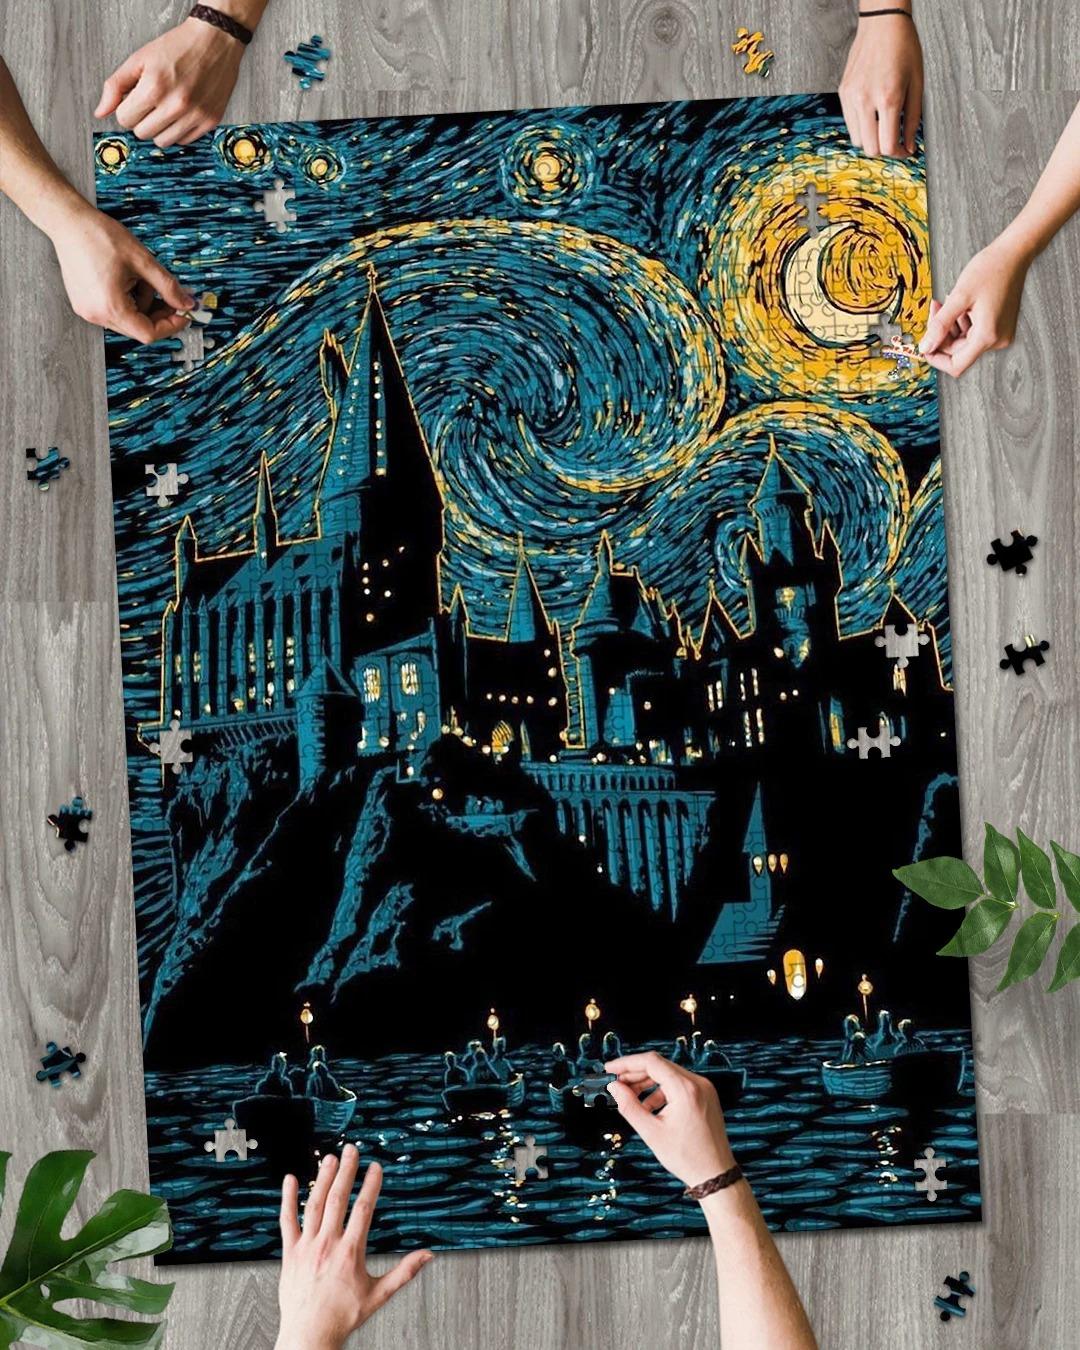 Hogwarts Starry Night jigsaw puzzles